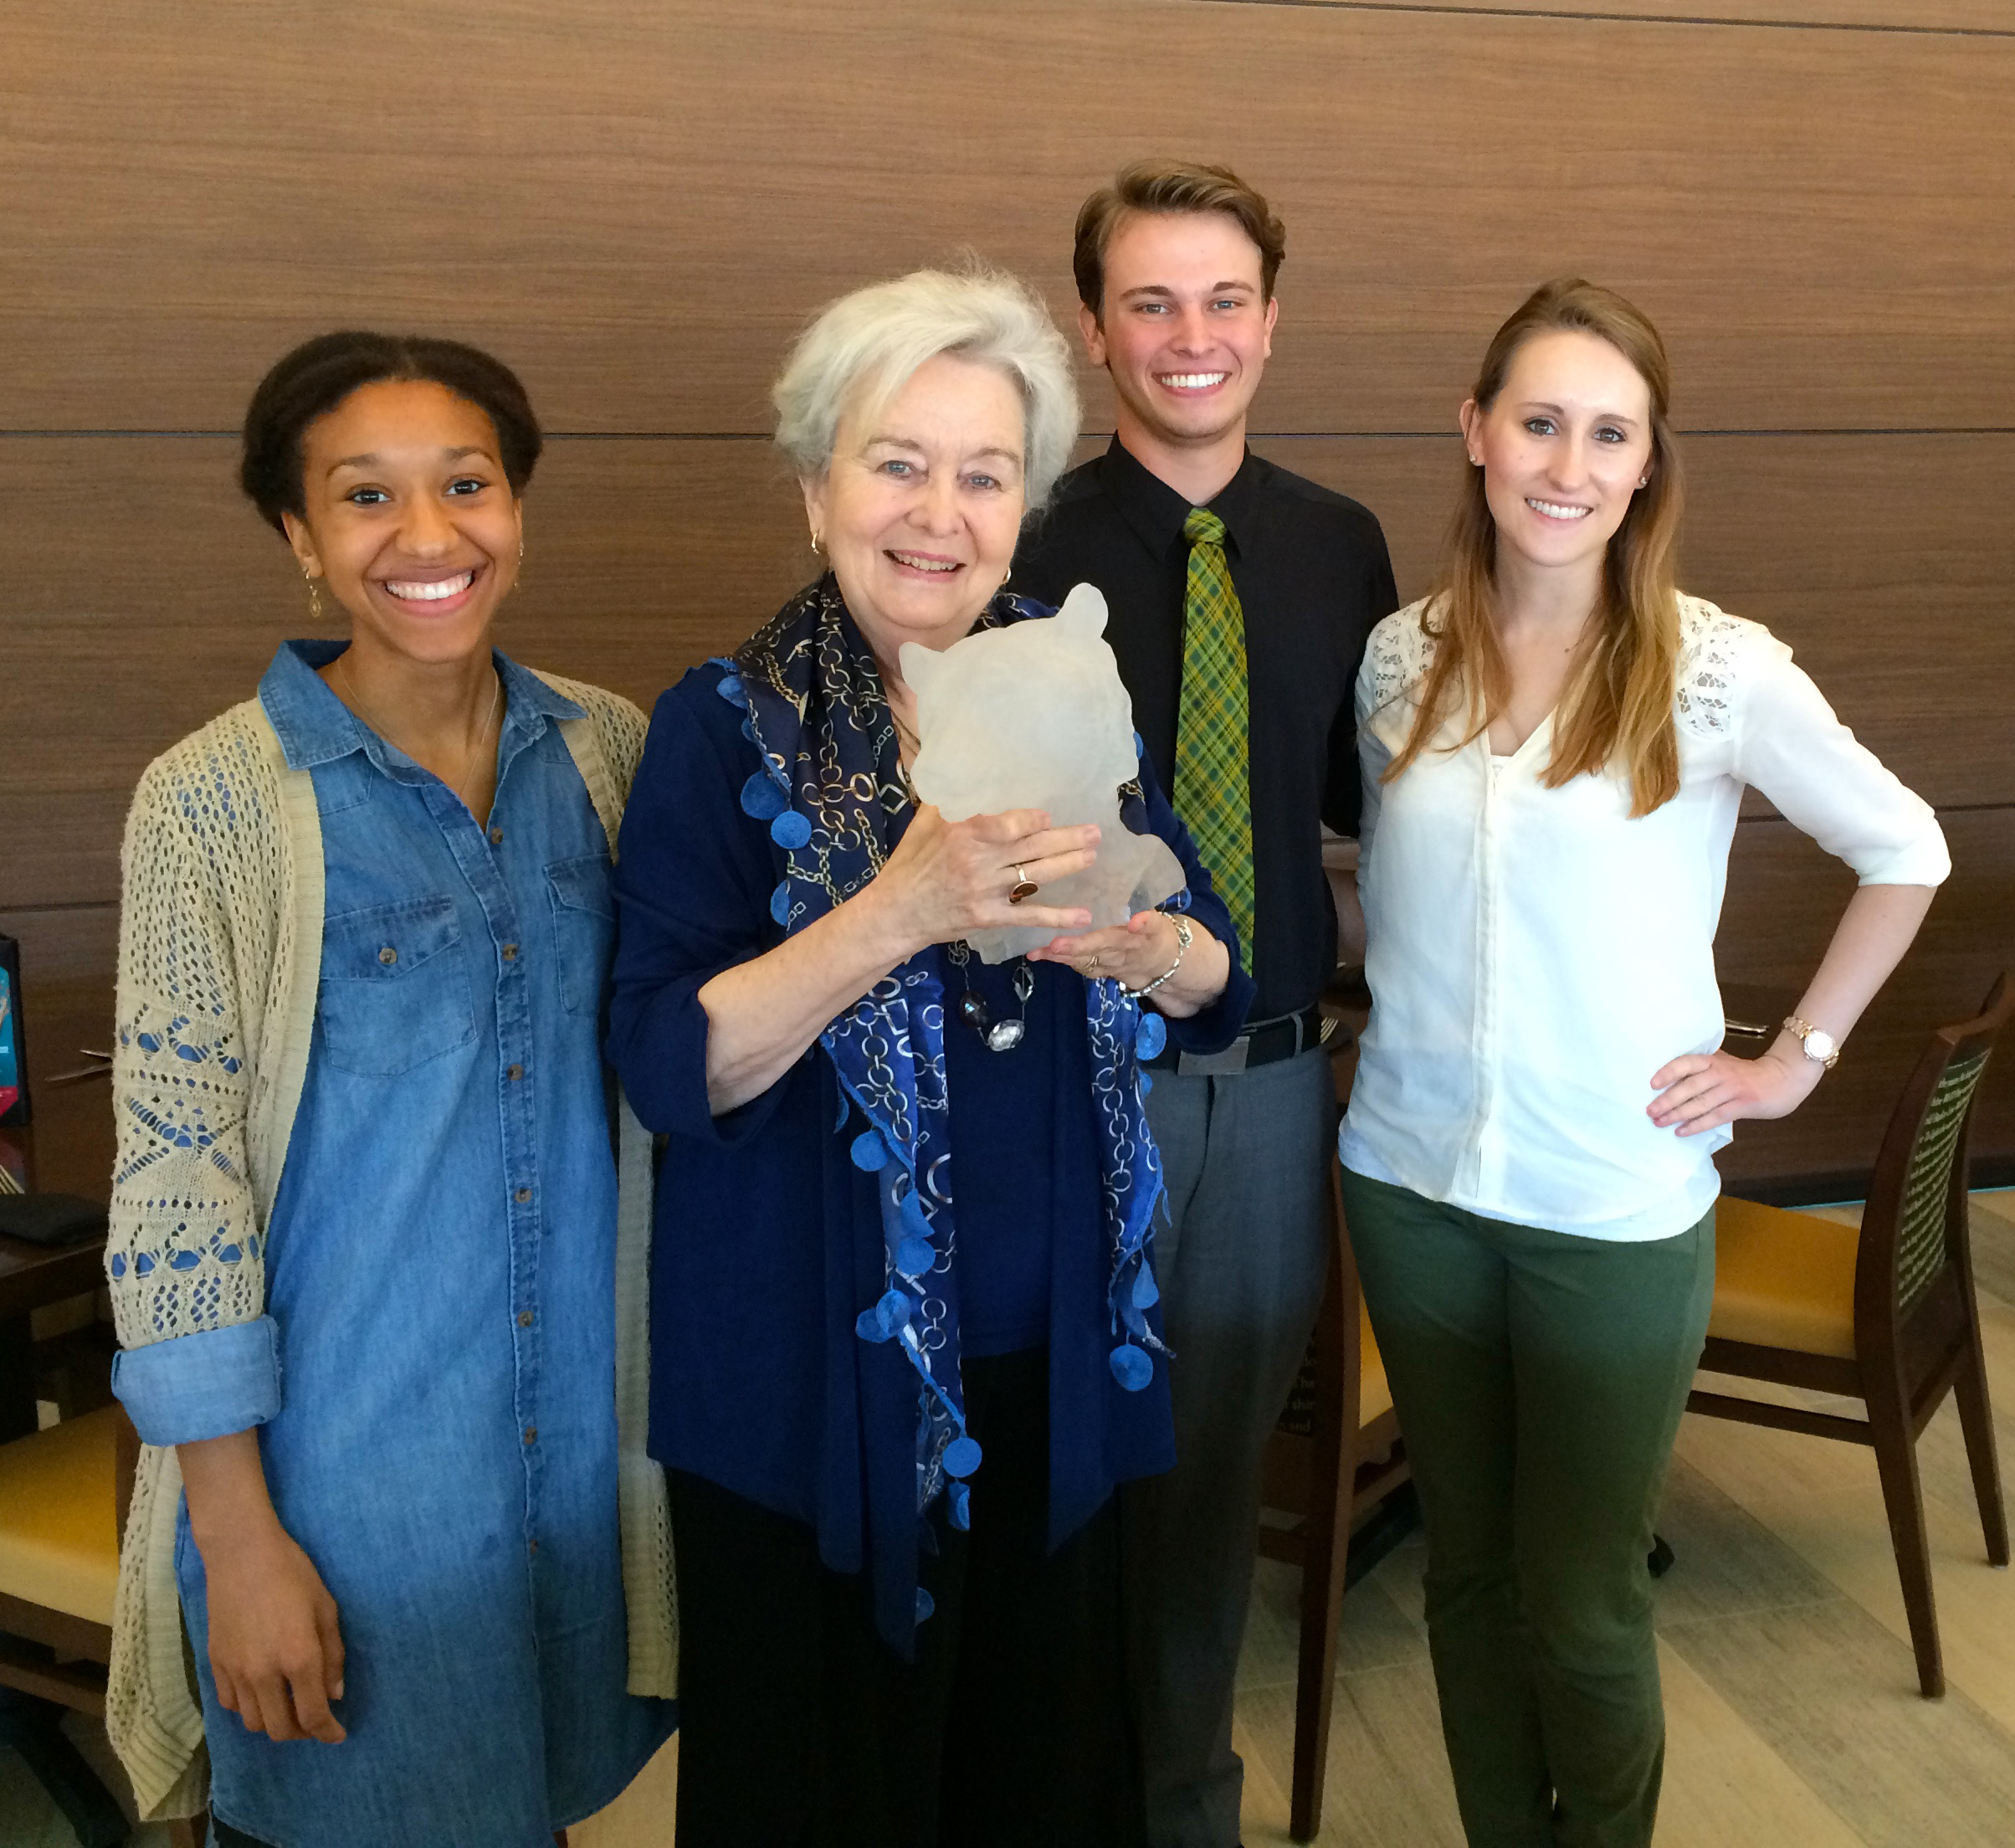 2016 URSA Award Recipients (left to right): Jade Conner, Elizabeth Vardaman,Tanner Hood and Mallory Meyers